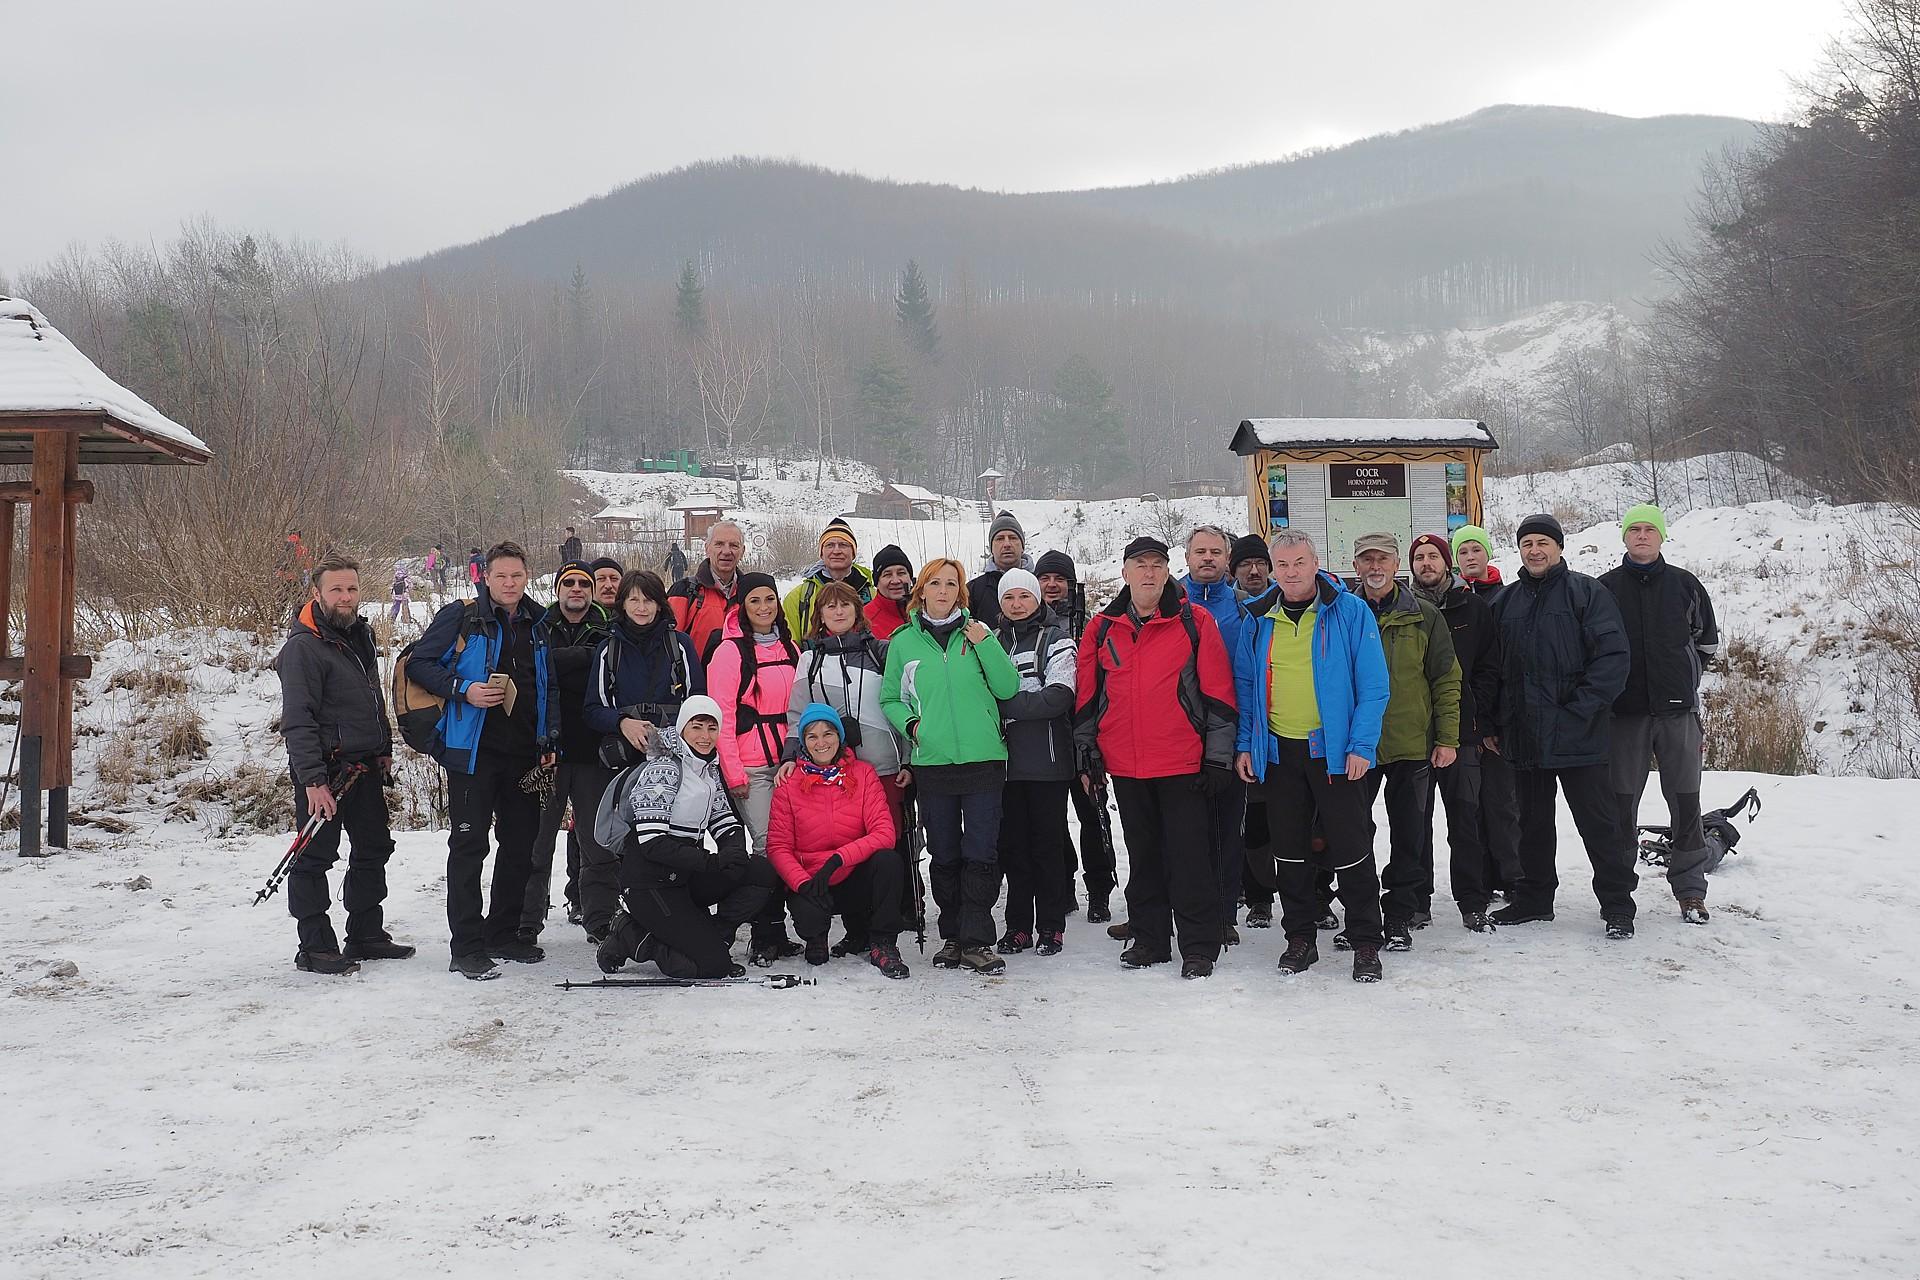 45.ročník Výstup na Sninský kameň 1005m 11.1.2020 (foto Tokár)